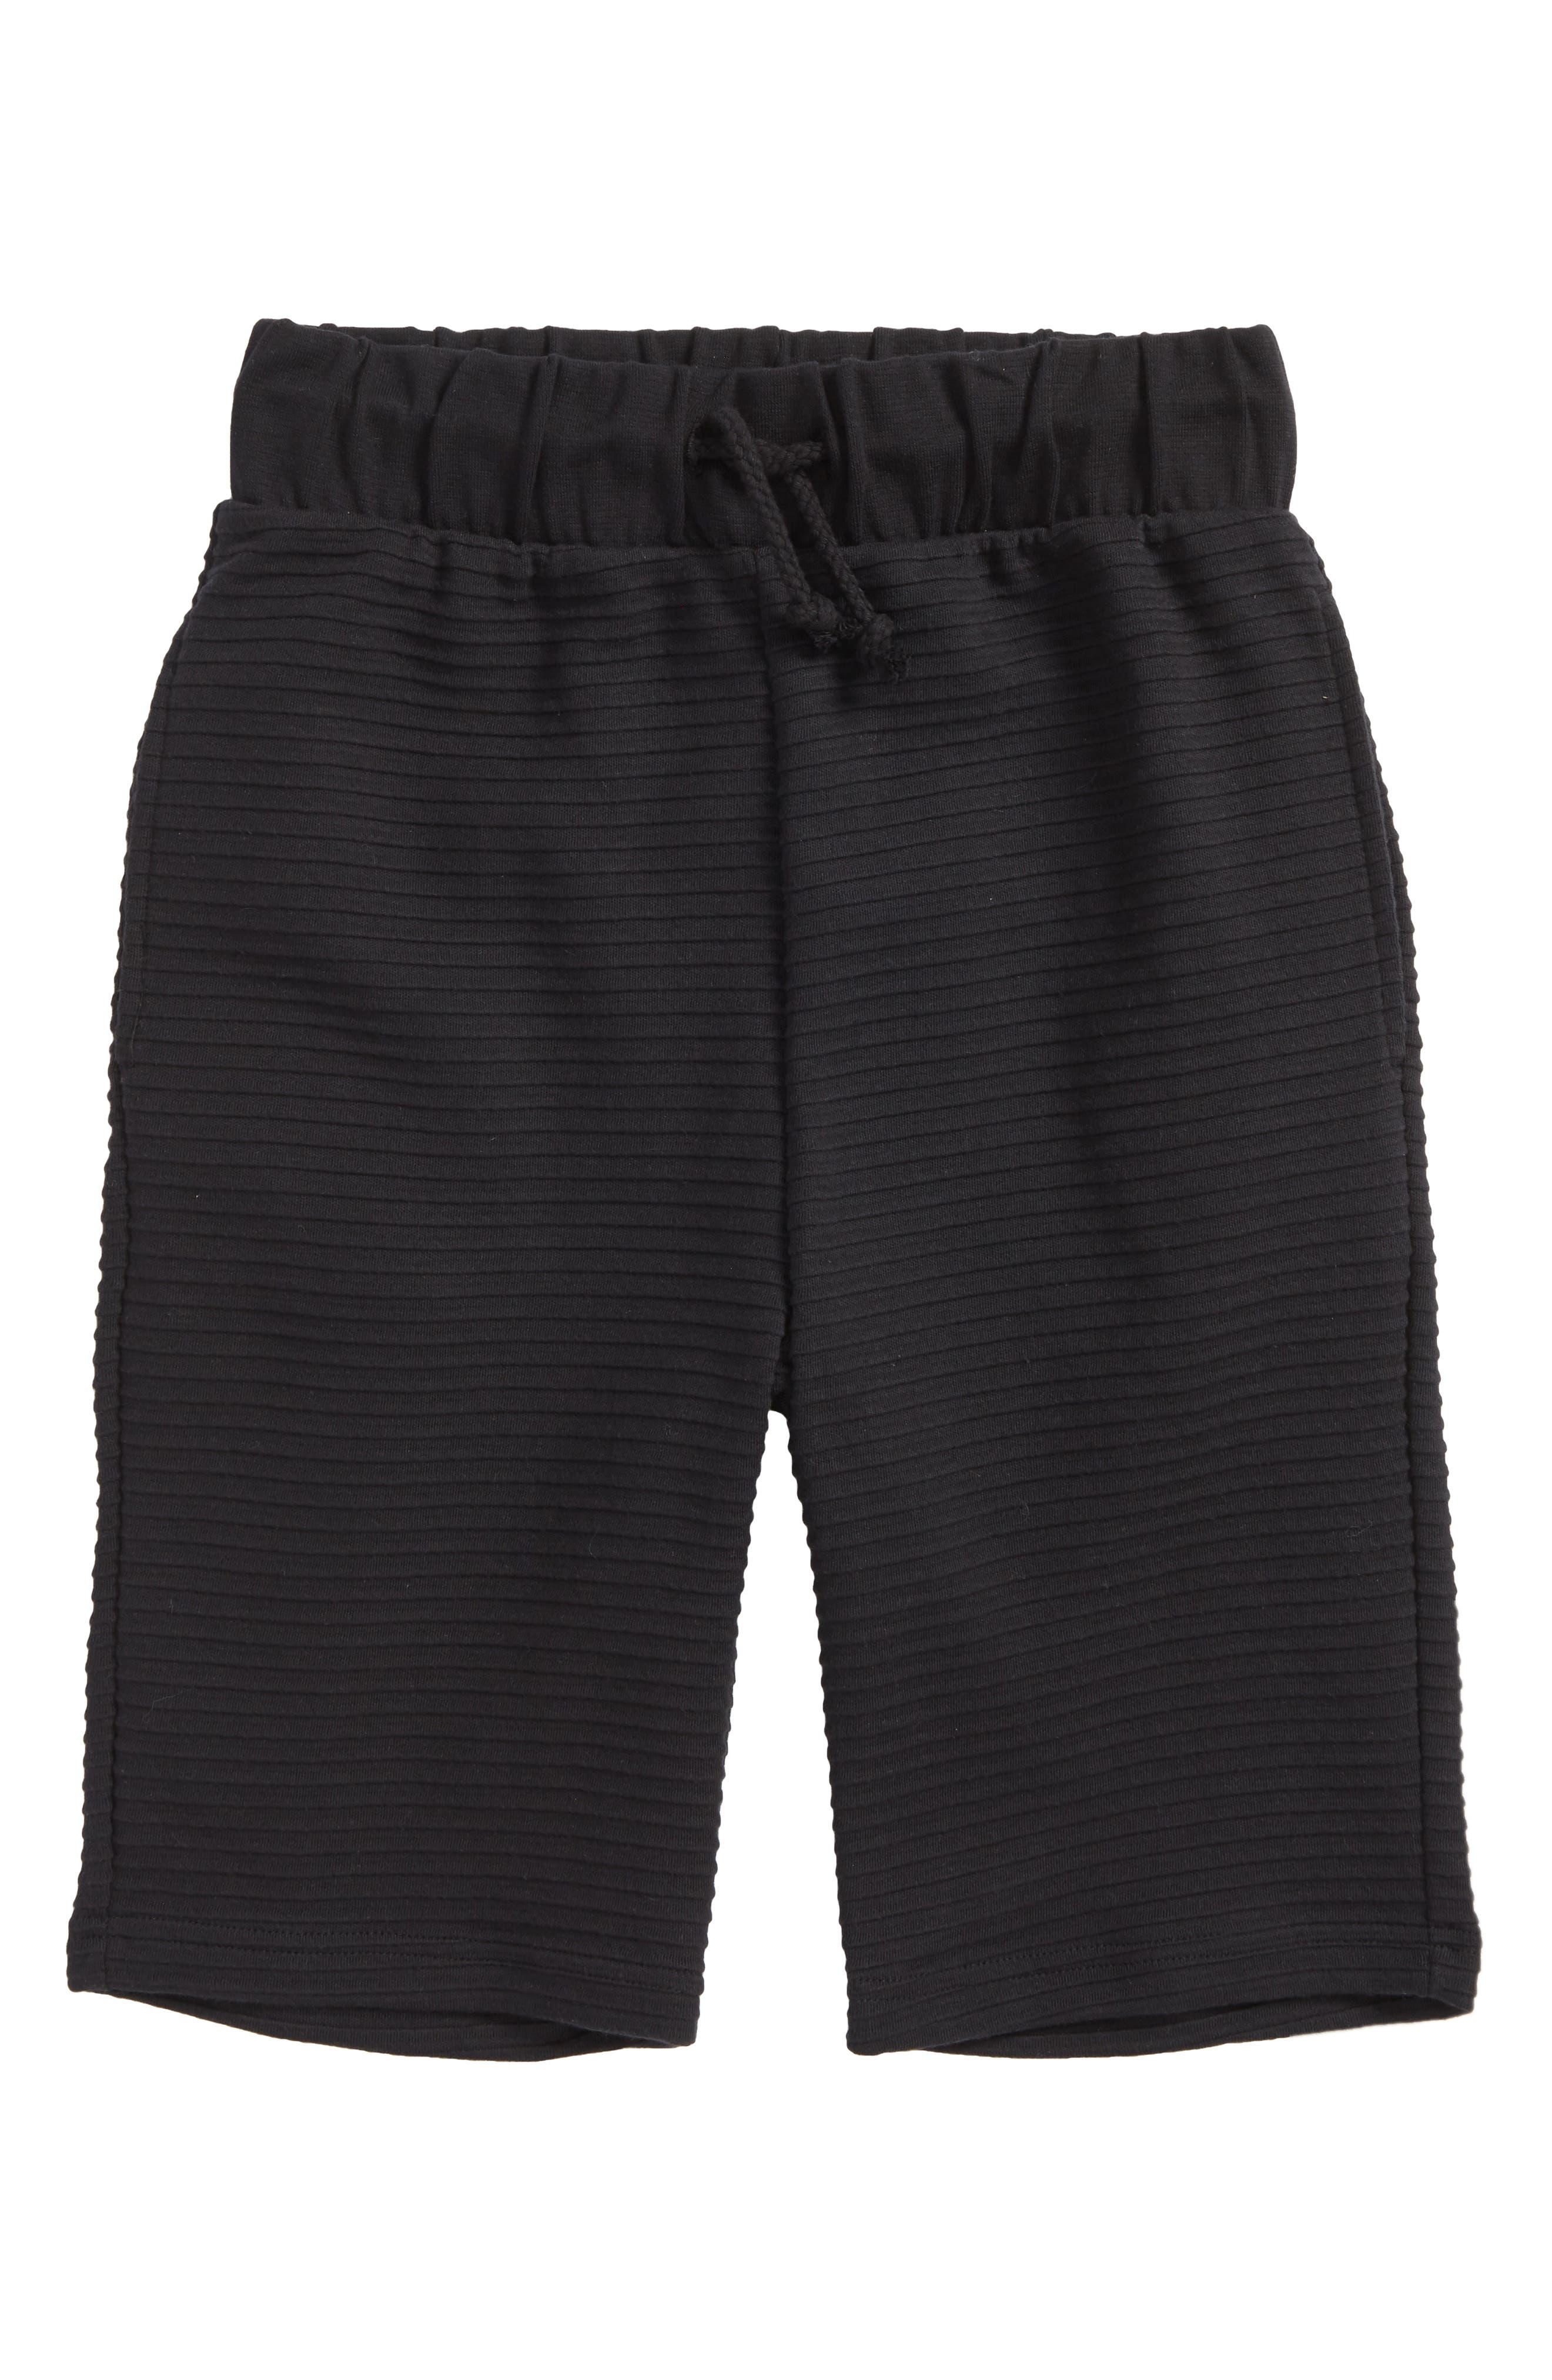 Freddie Knit Shorts,                         Main,                         color, Black